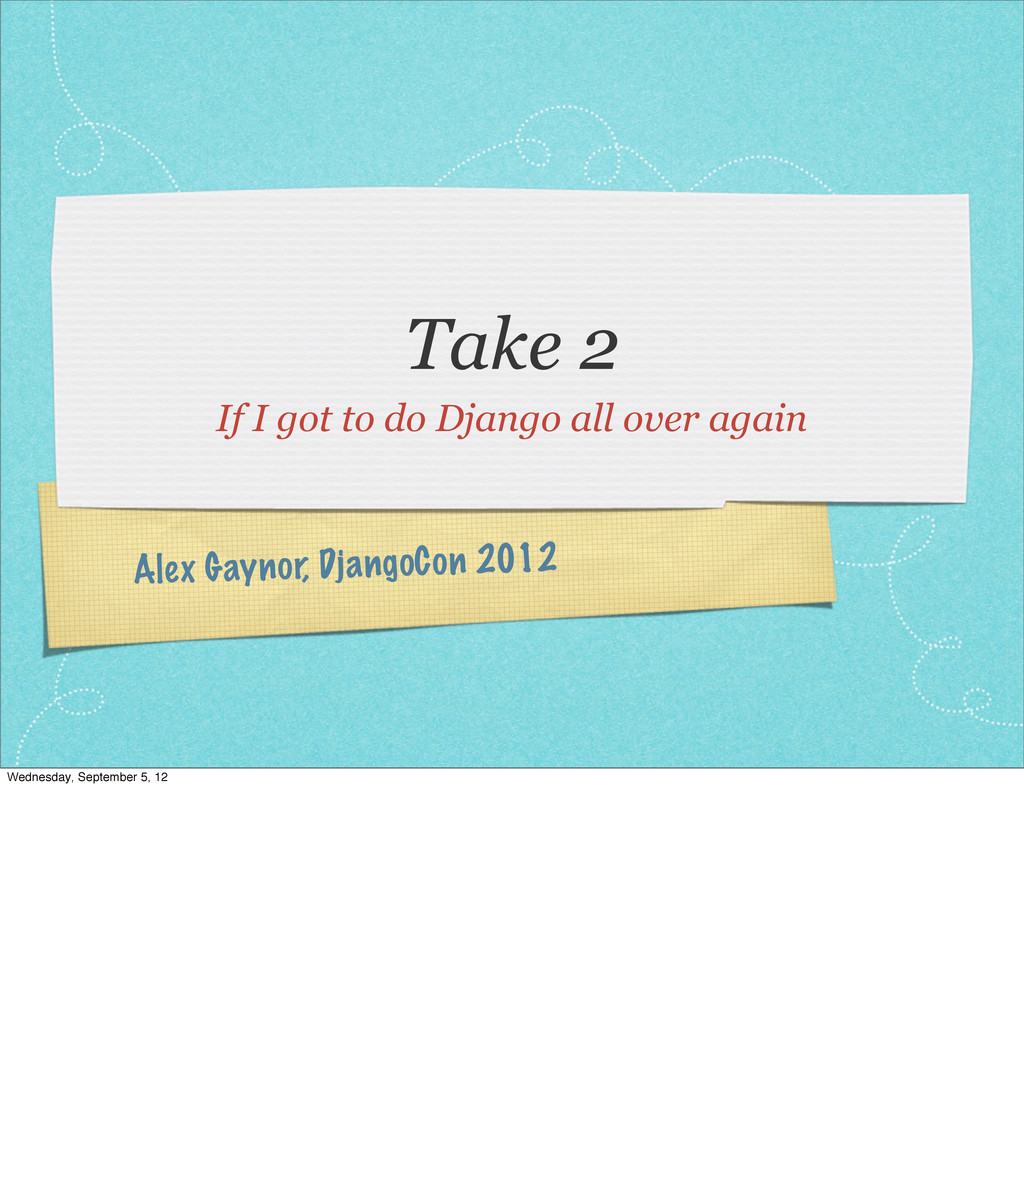 Alex Gaynor, DjangoCon 2012 Take 2 If I got to ...